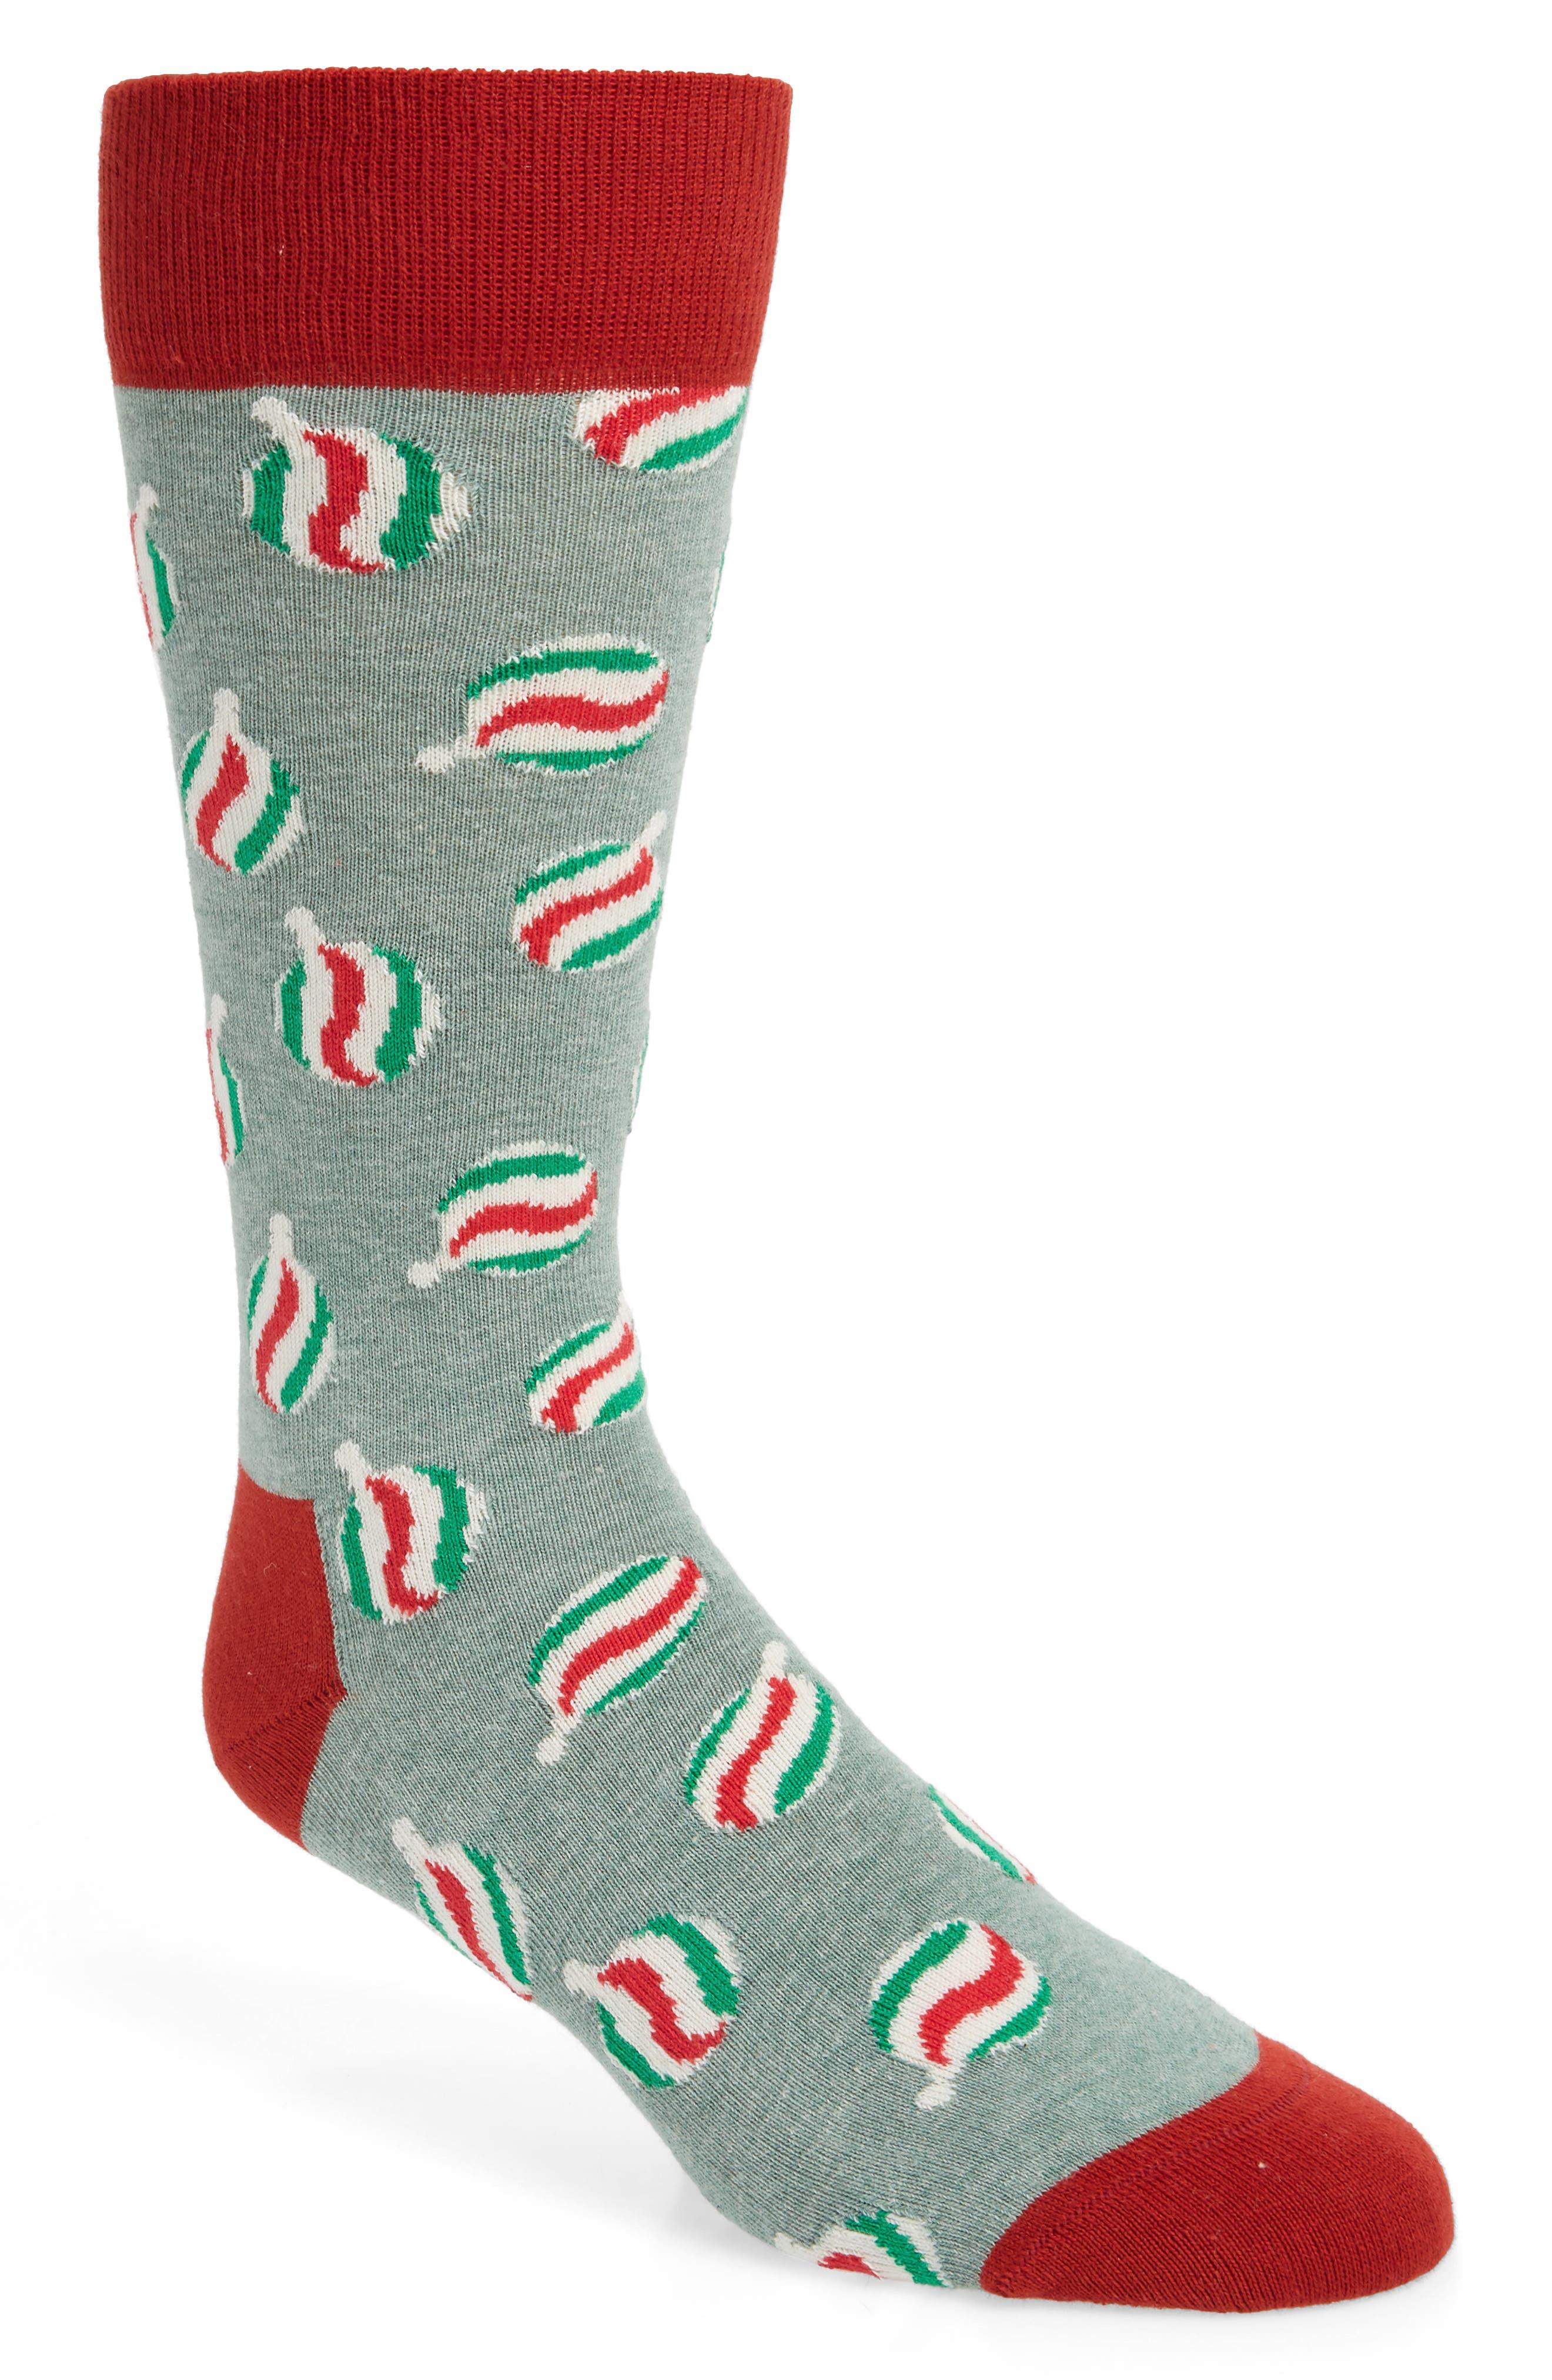 Holiday Bauble Socks,                         Main,                         color, GREY